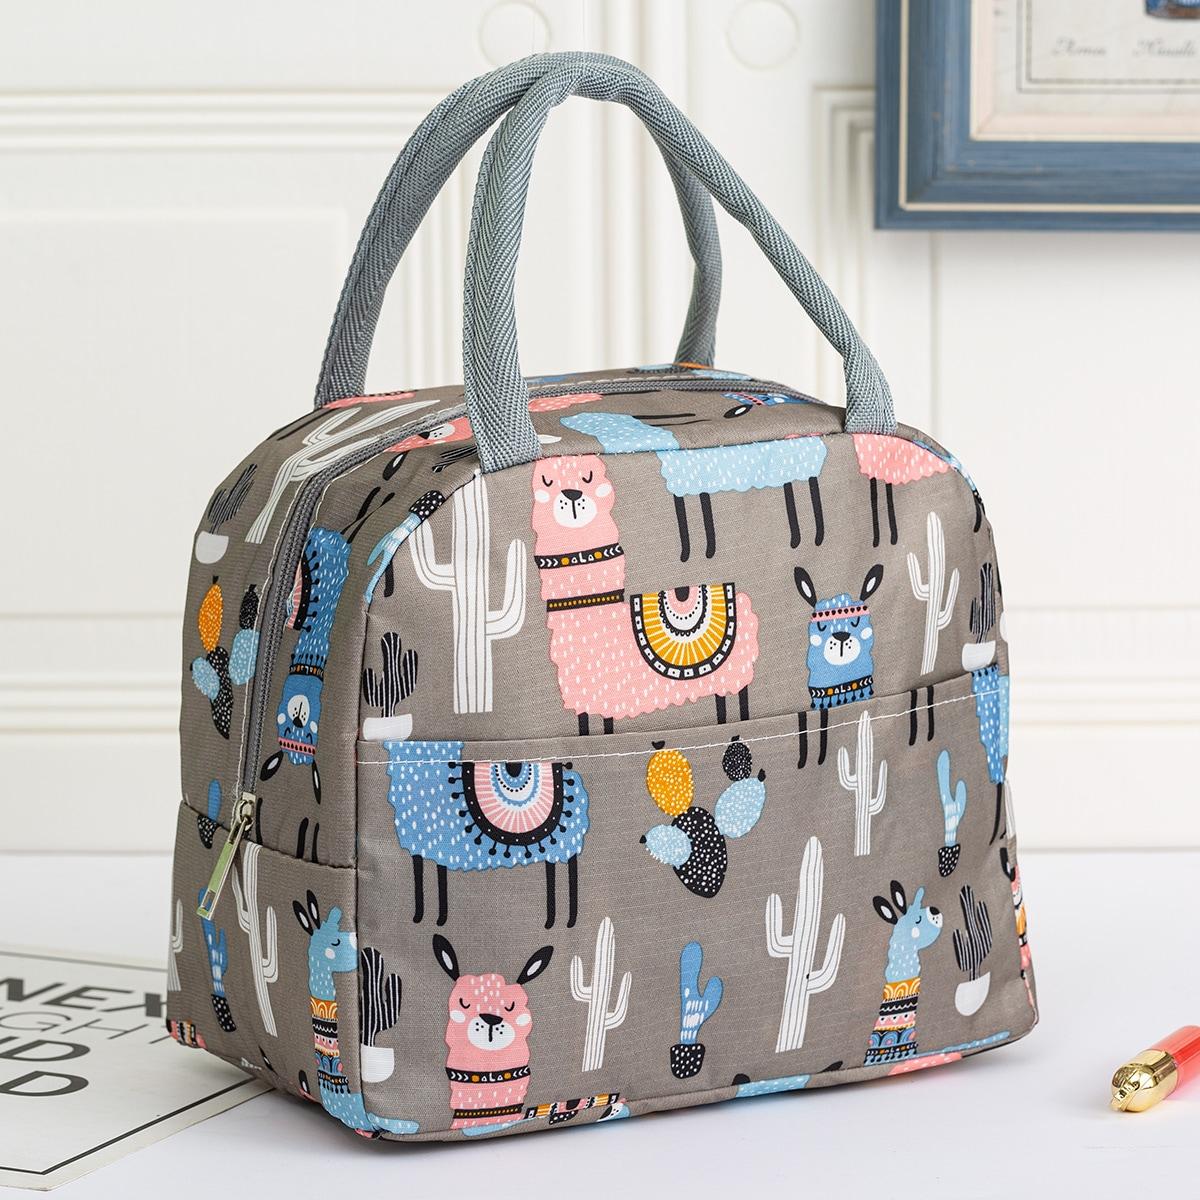 SHEIN / Alpaca Print Insulated Lunch Bag